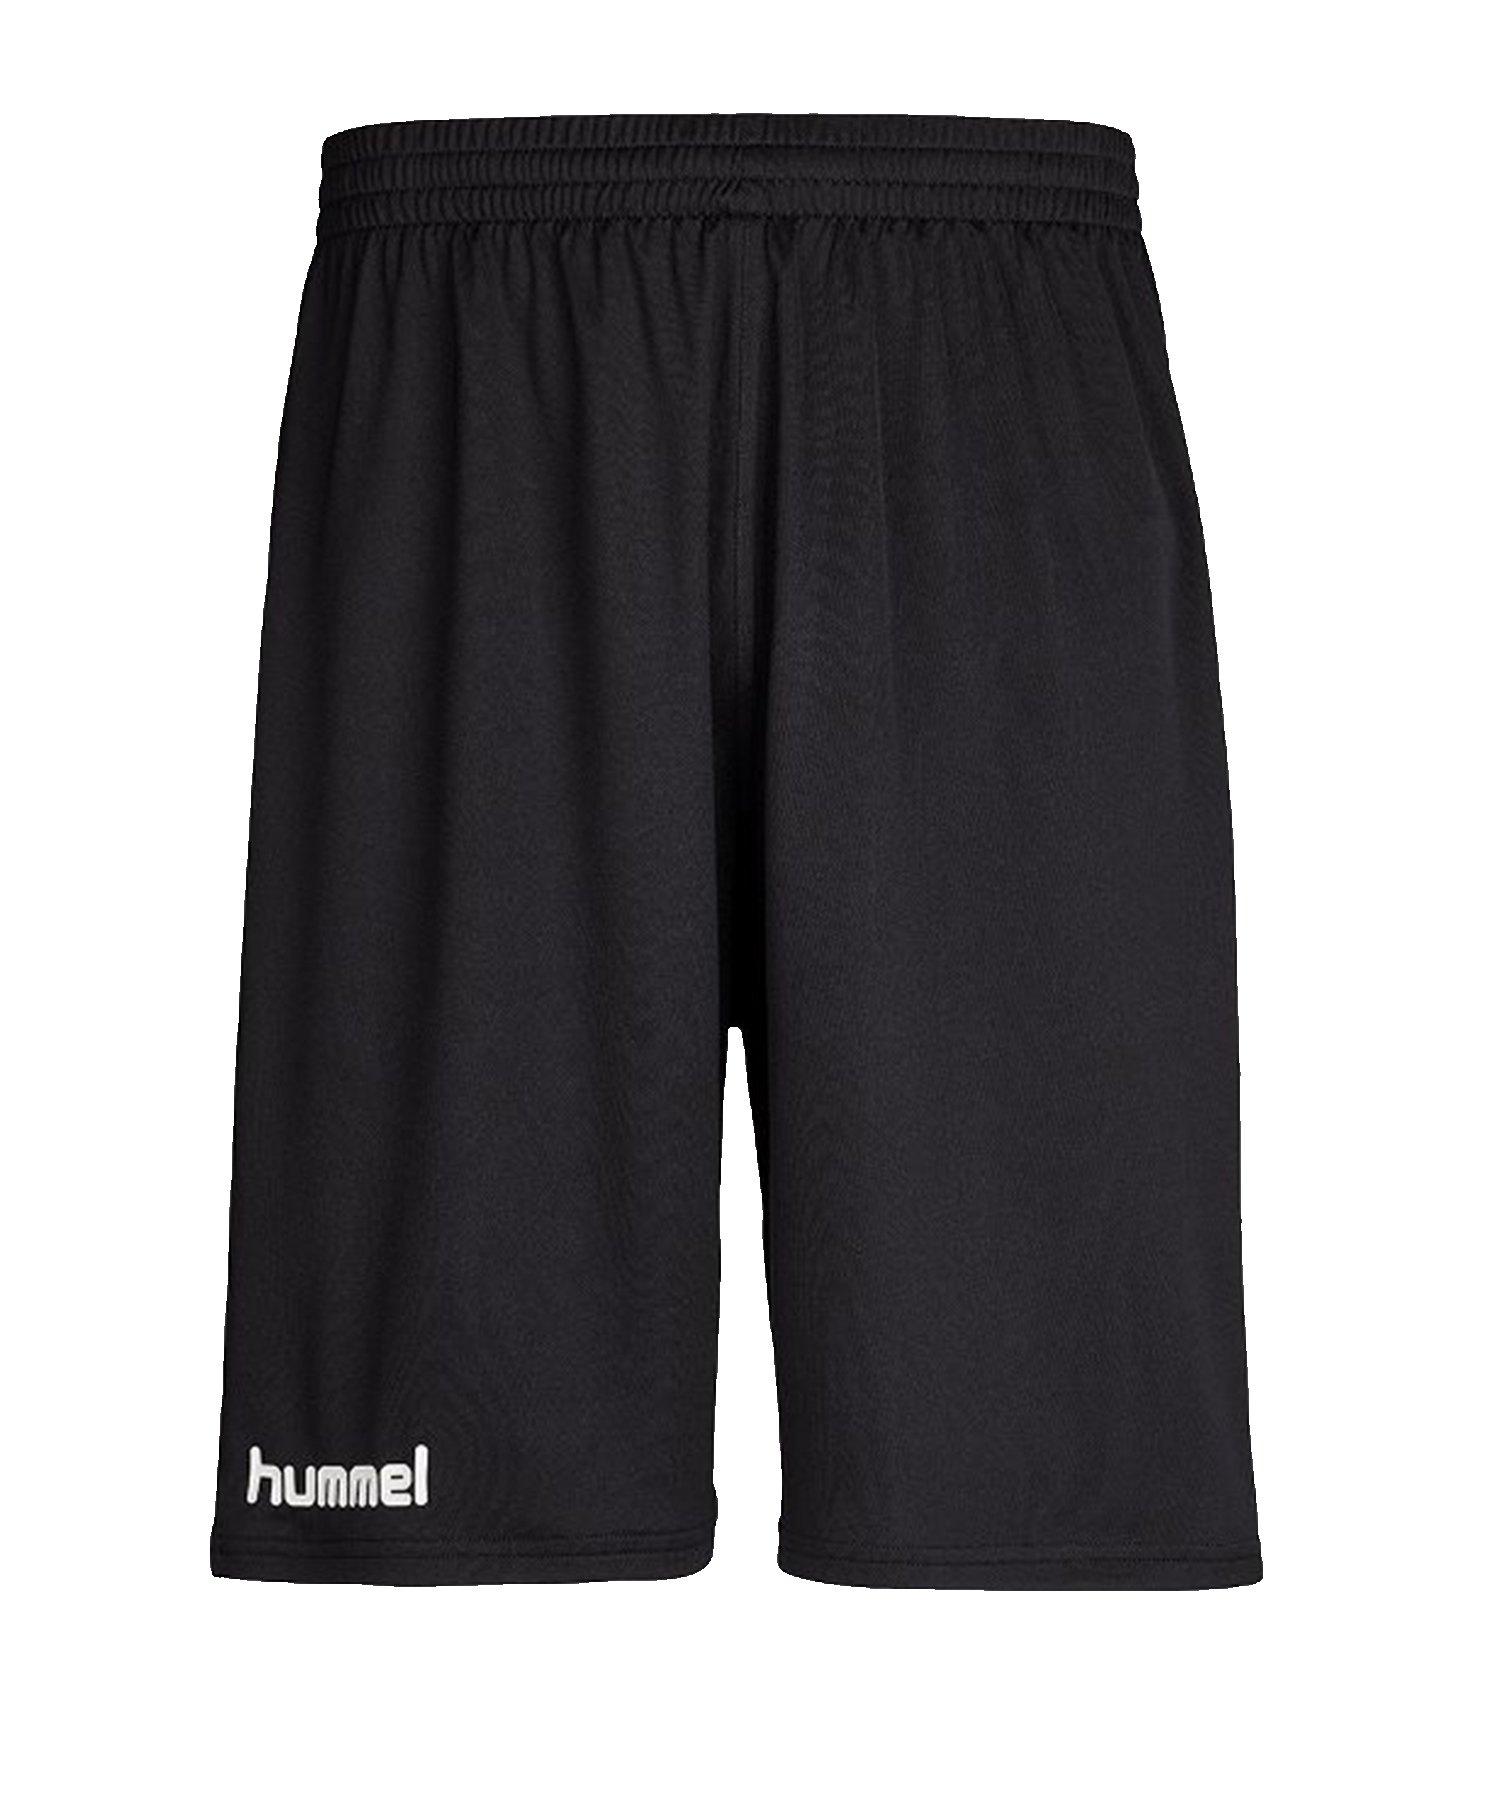 Hummel Core Basket Short Schwarz F2001 - schwarz